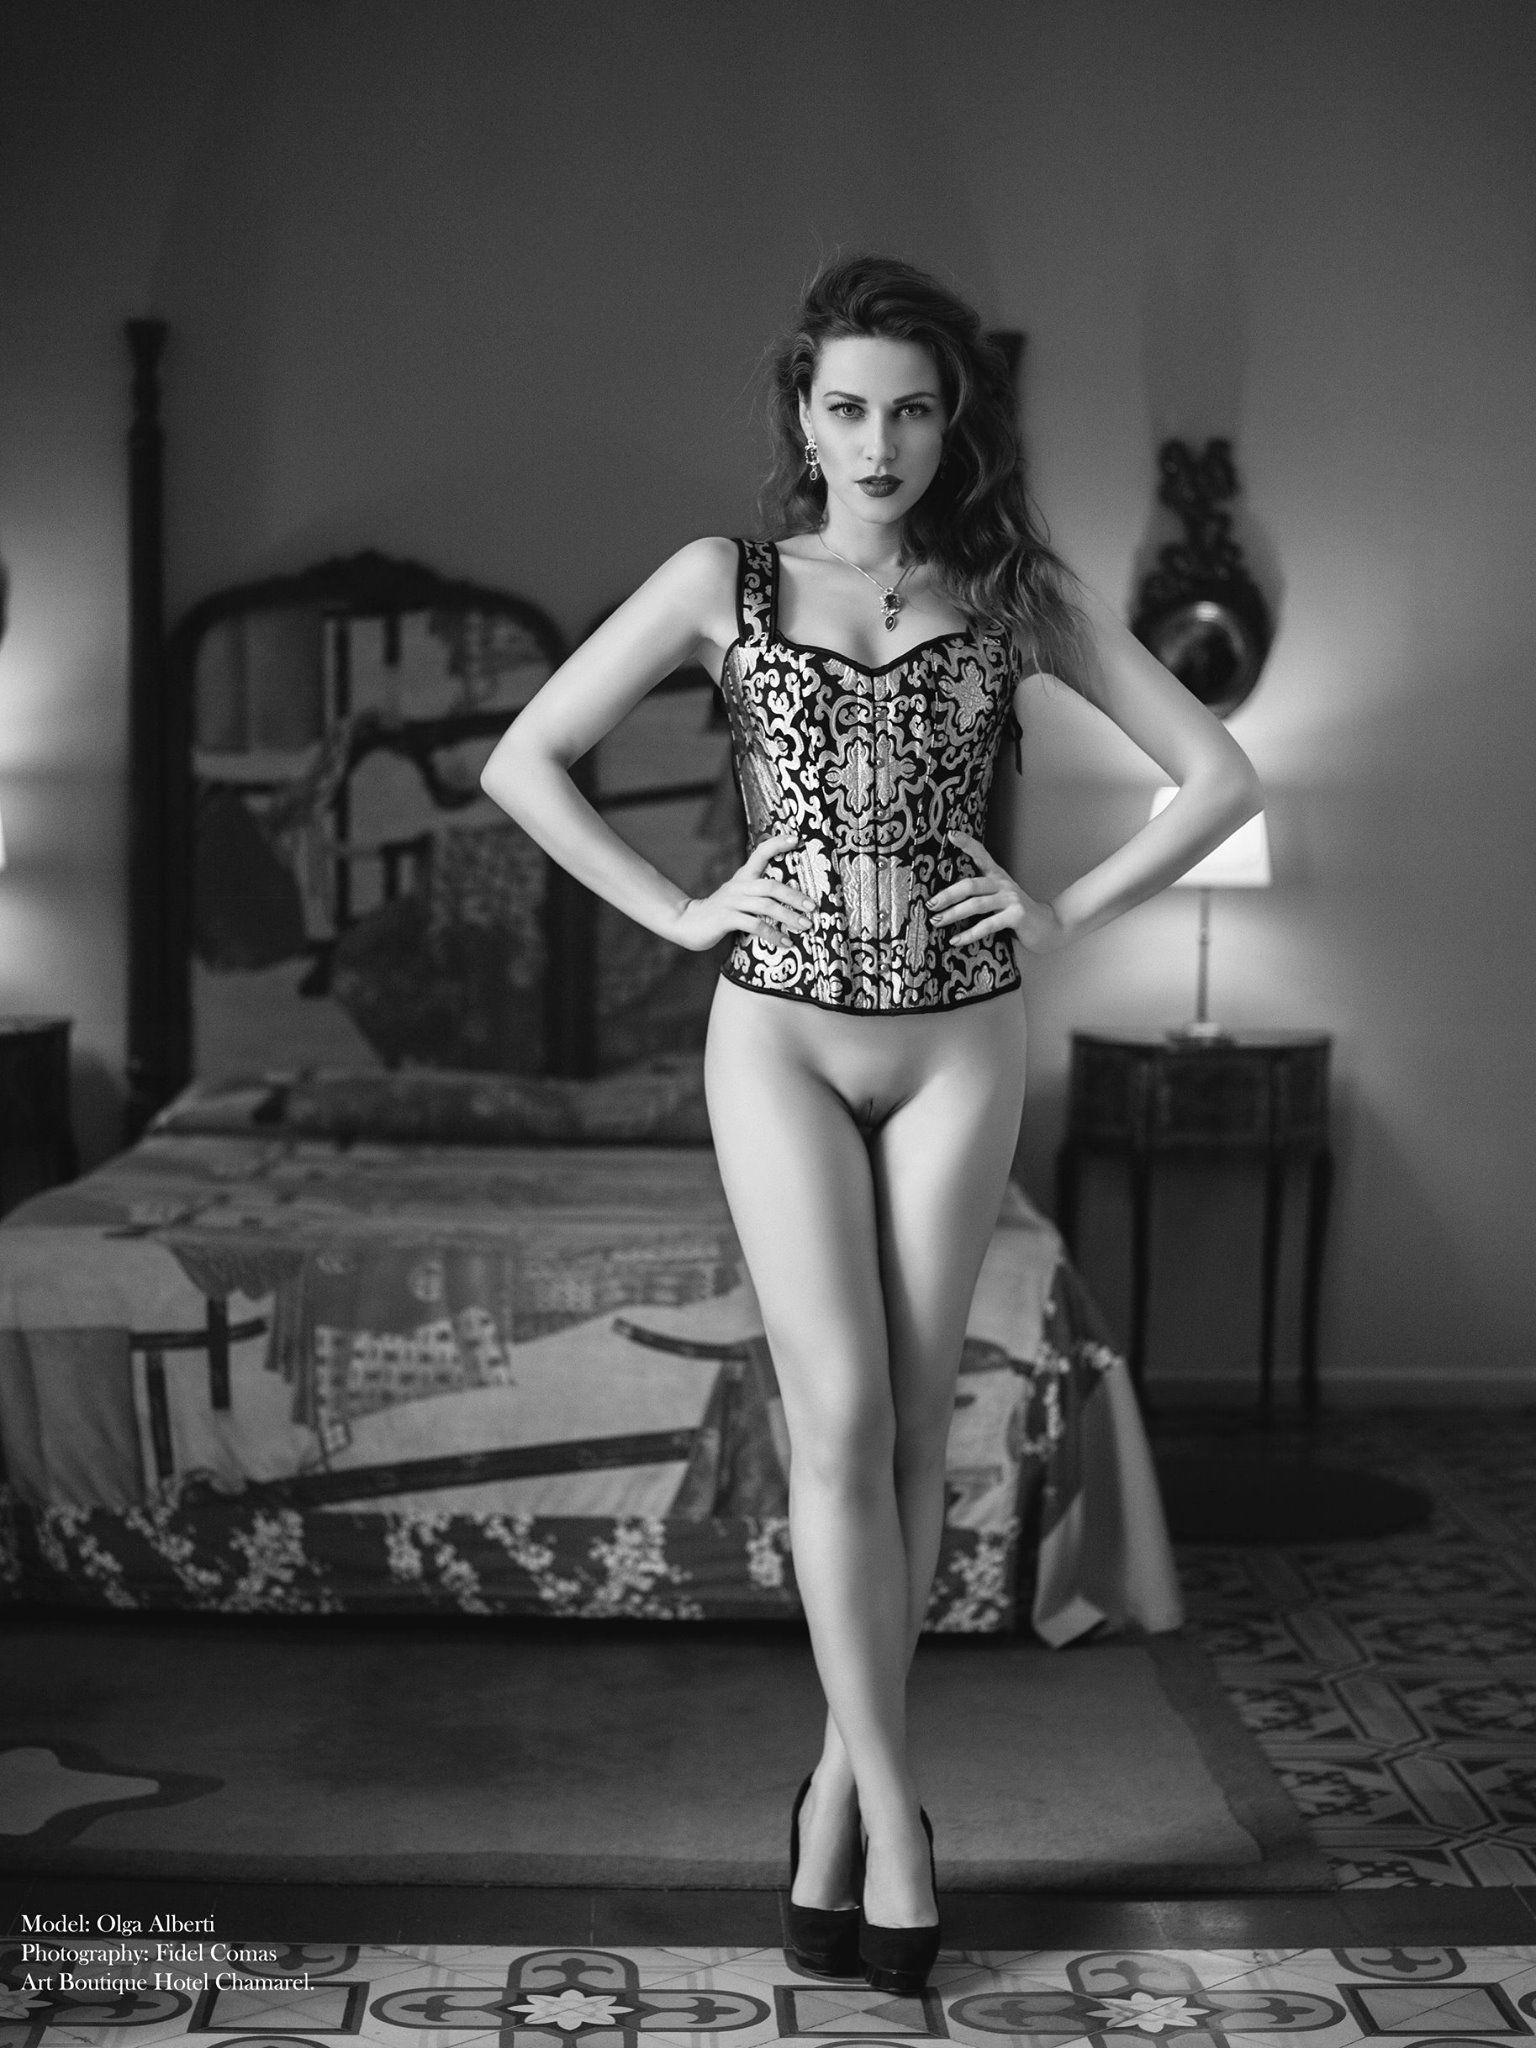 Paparazzi Olga Alberti nudes (58 photos), Topless, Sideboobs, Feet, underwear 2017